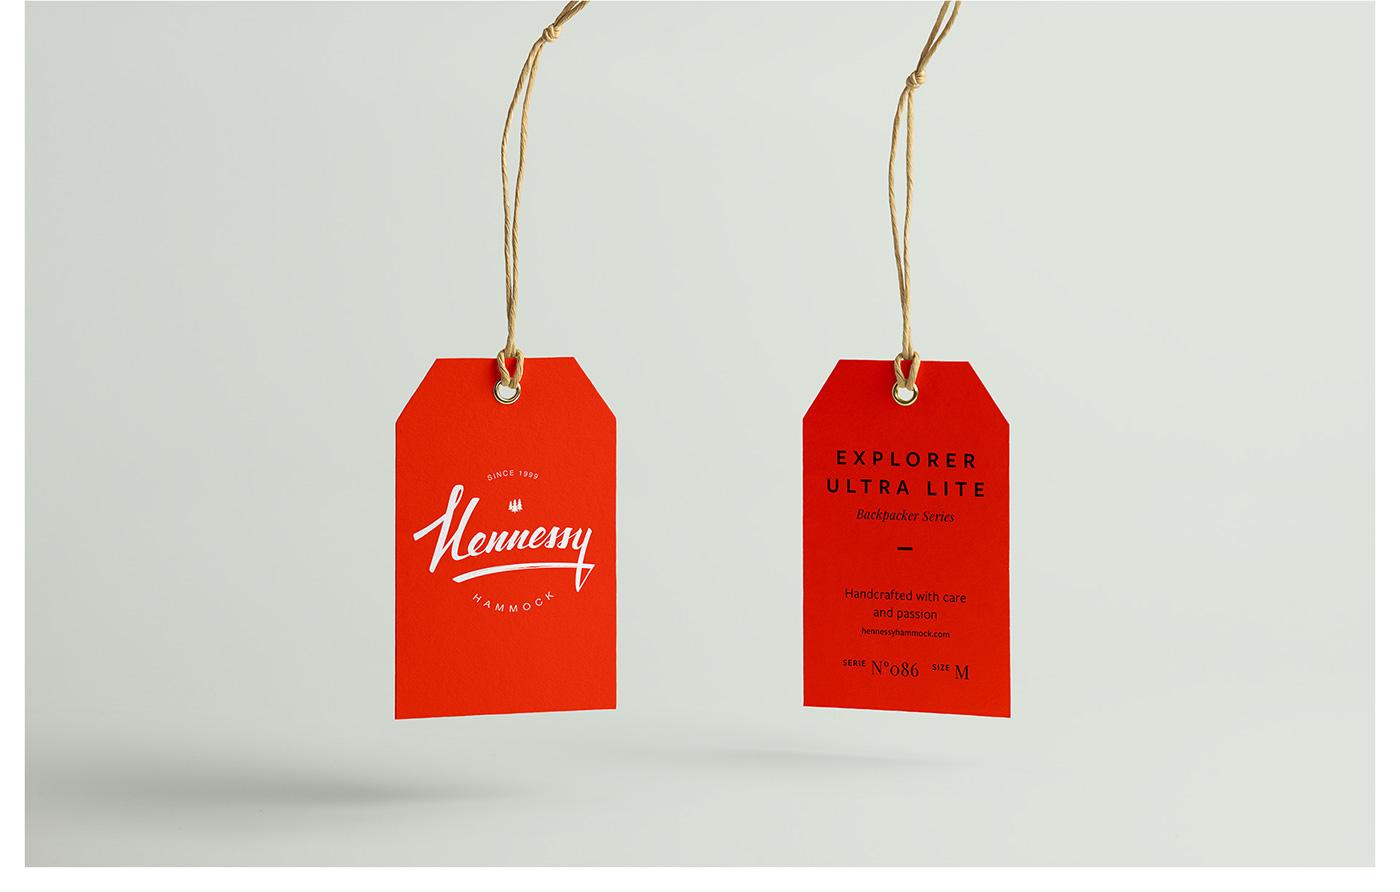 Hammock camping ux UI e-commerce branding  logo lettering Website product